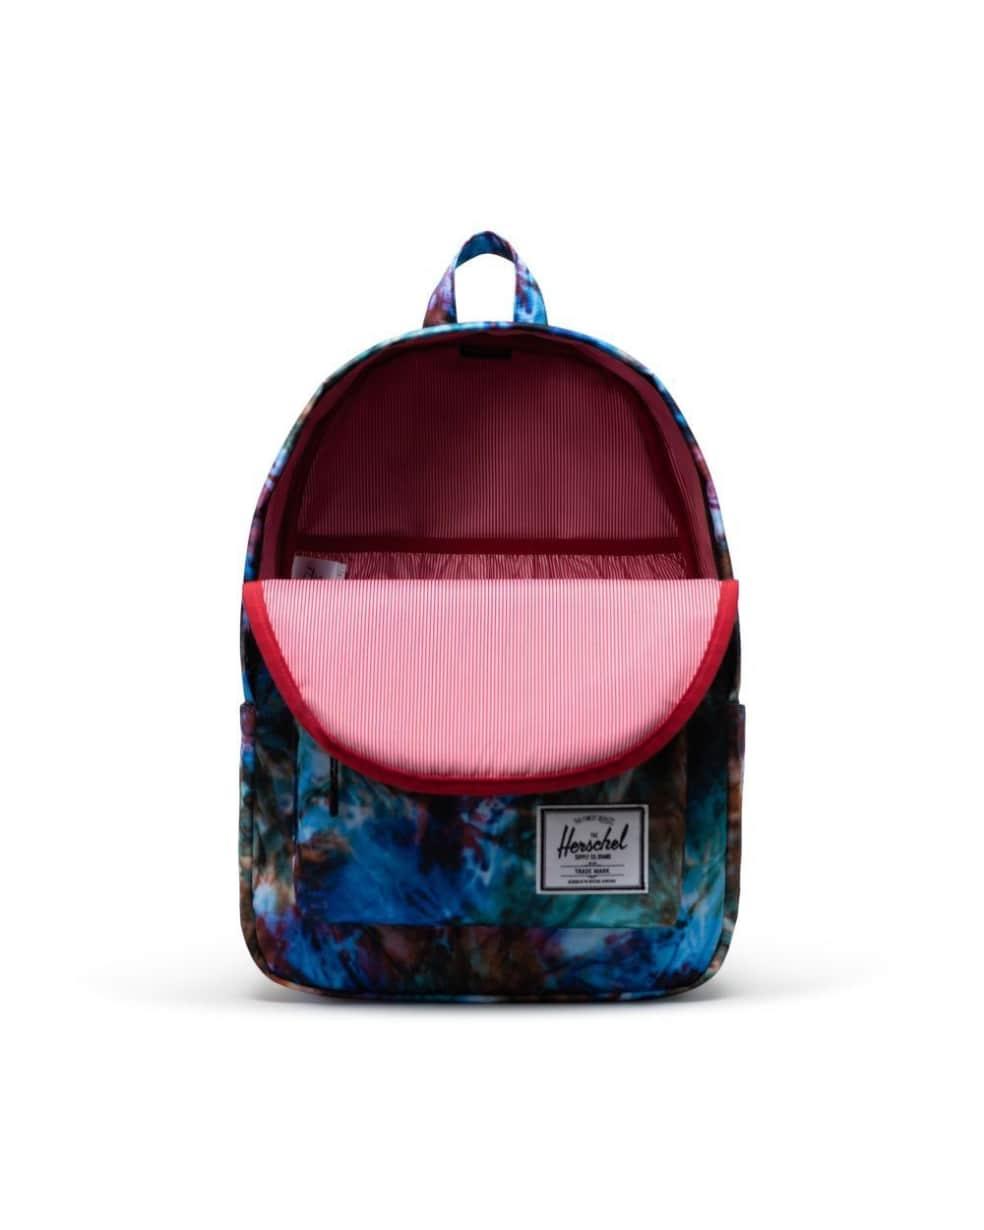 Herschel Classic XL Backpack - Summer Tie Dye   Backpack by Herschel Supply Co. 2